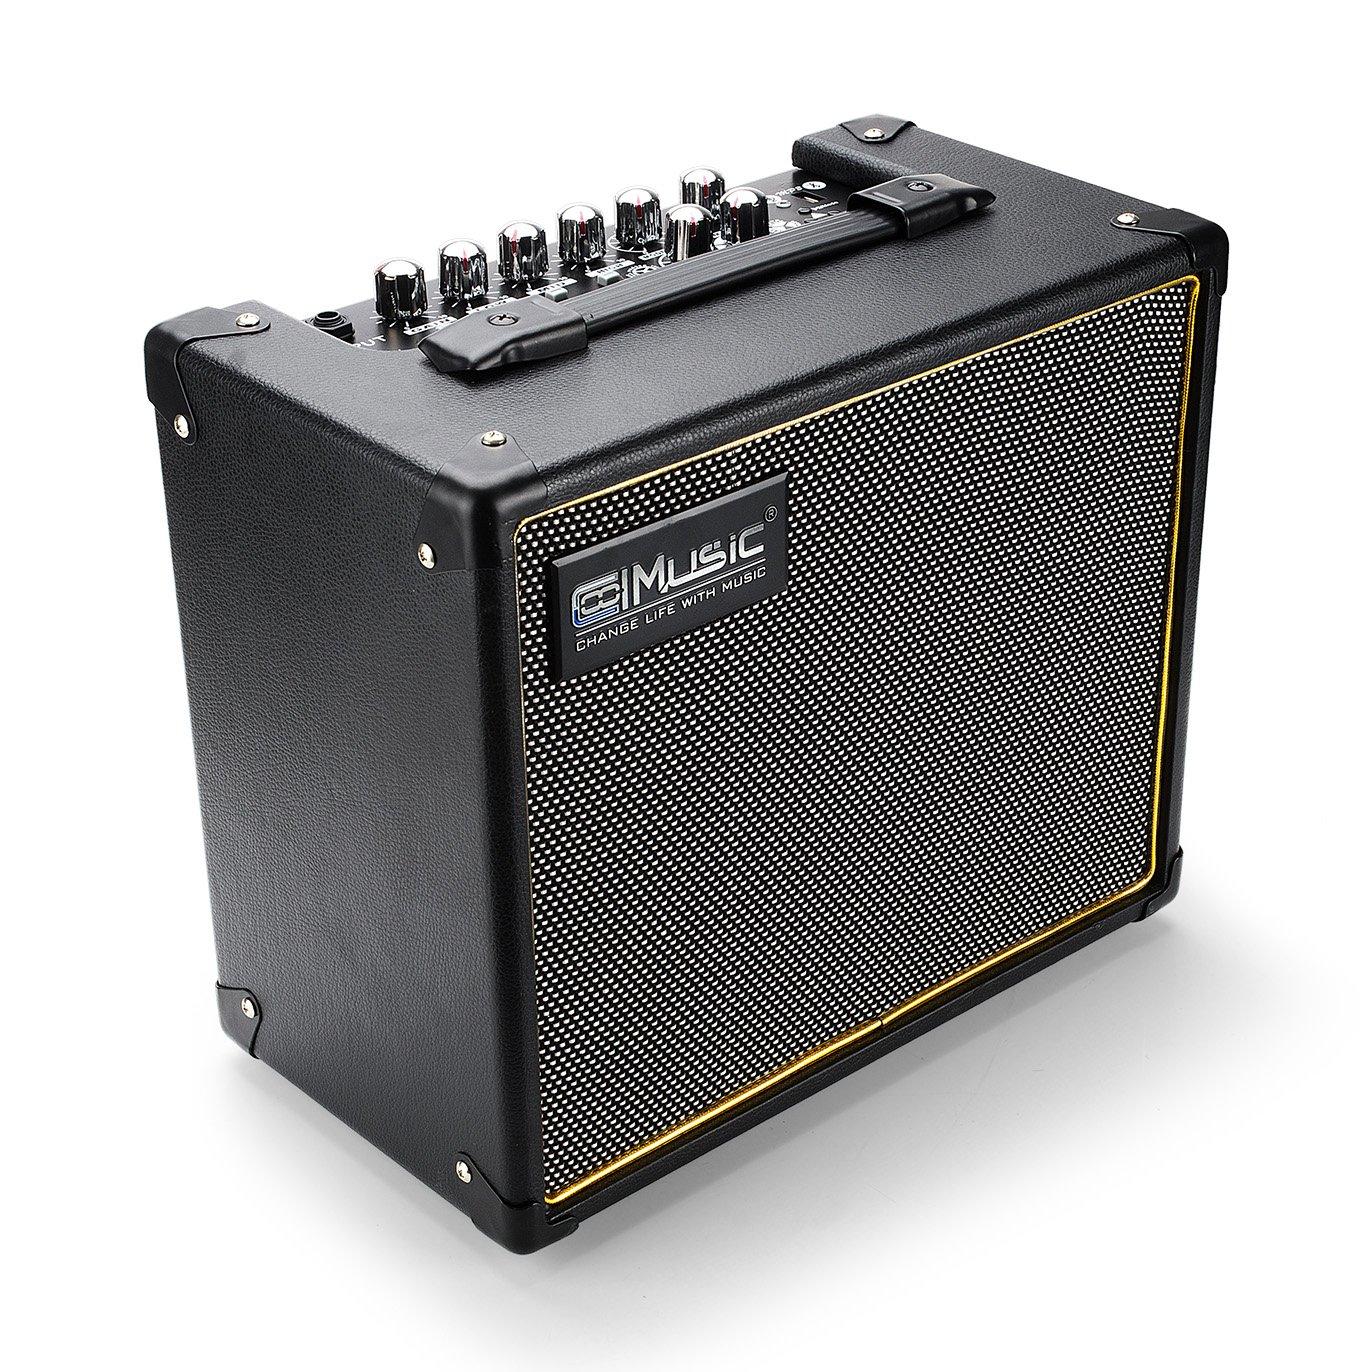 Coolmusic Bluetooth Fantasy20 20W Smart Digital Guitar Amplifier DSP ( Reverb, Delay, Phaser, Flanger, Chorus, Tremolo ) Speaker